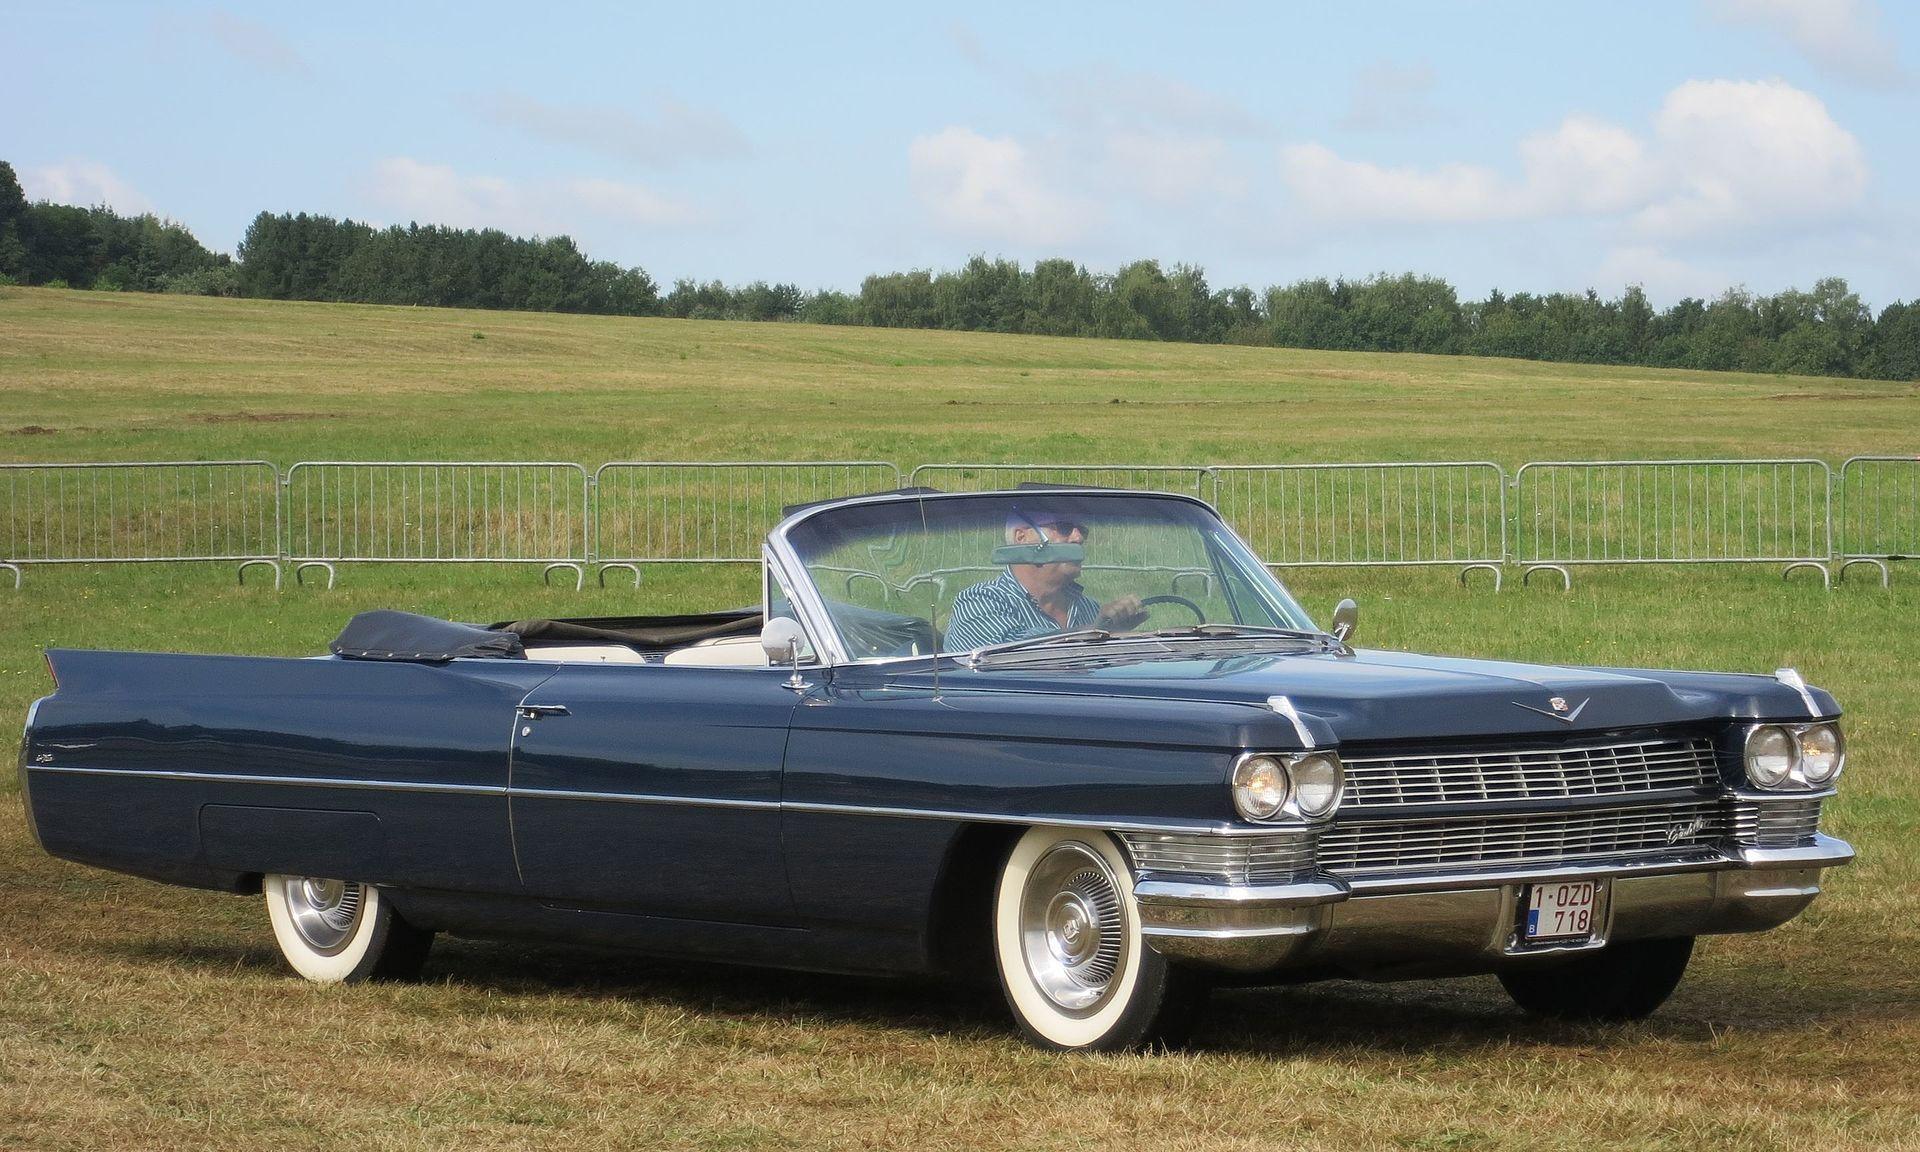 1964 Cadillac DeVille convertible | Cadillac | Pinterest | Cadillac